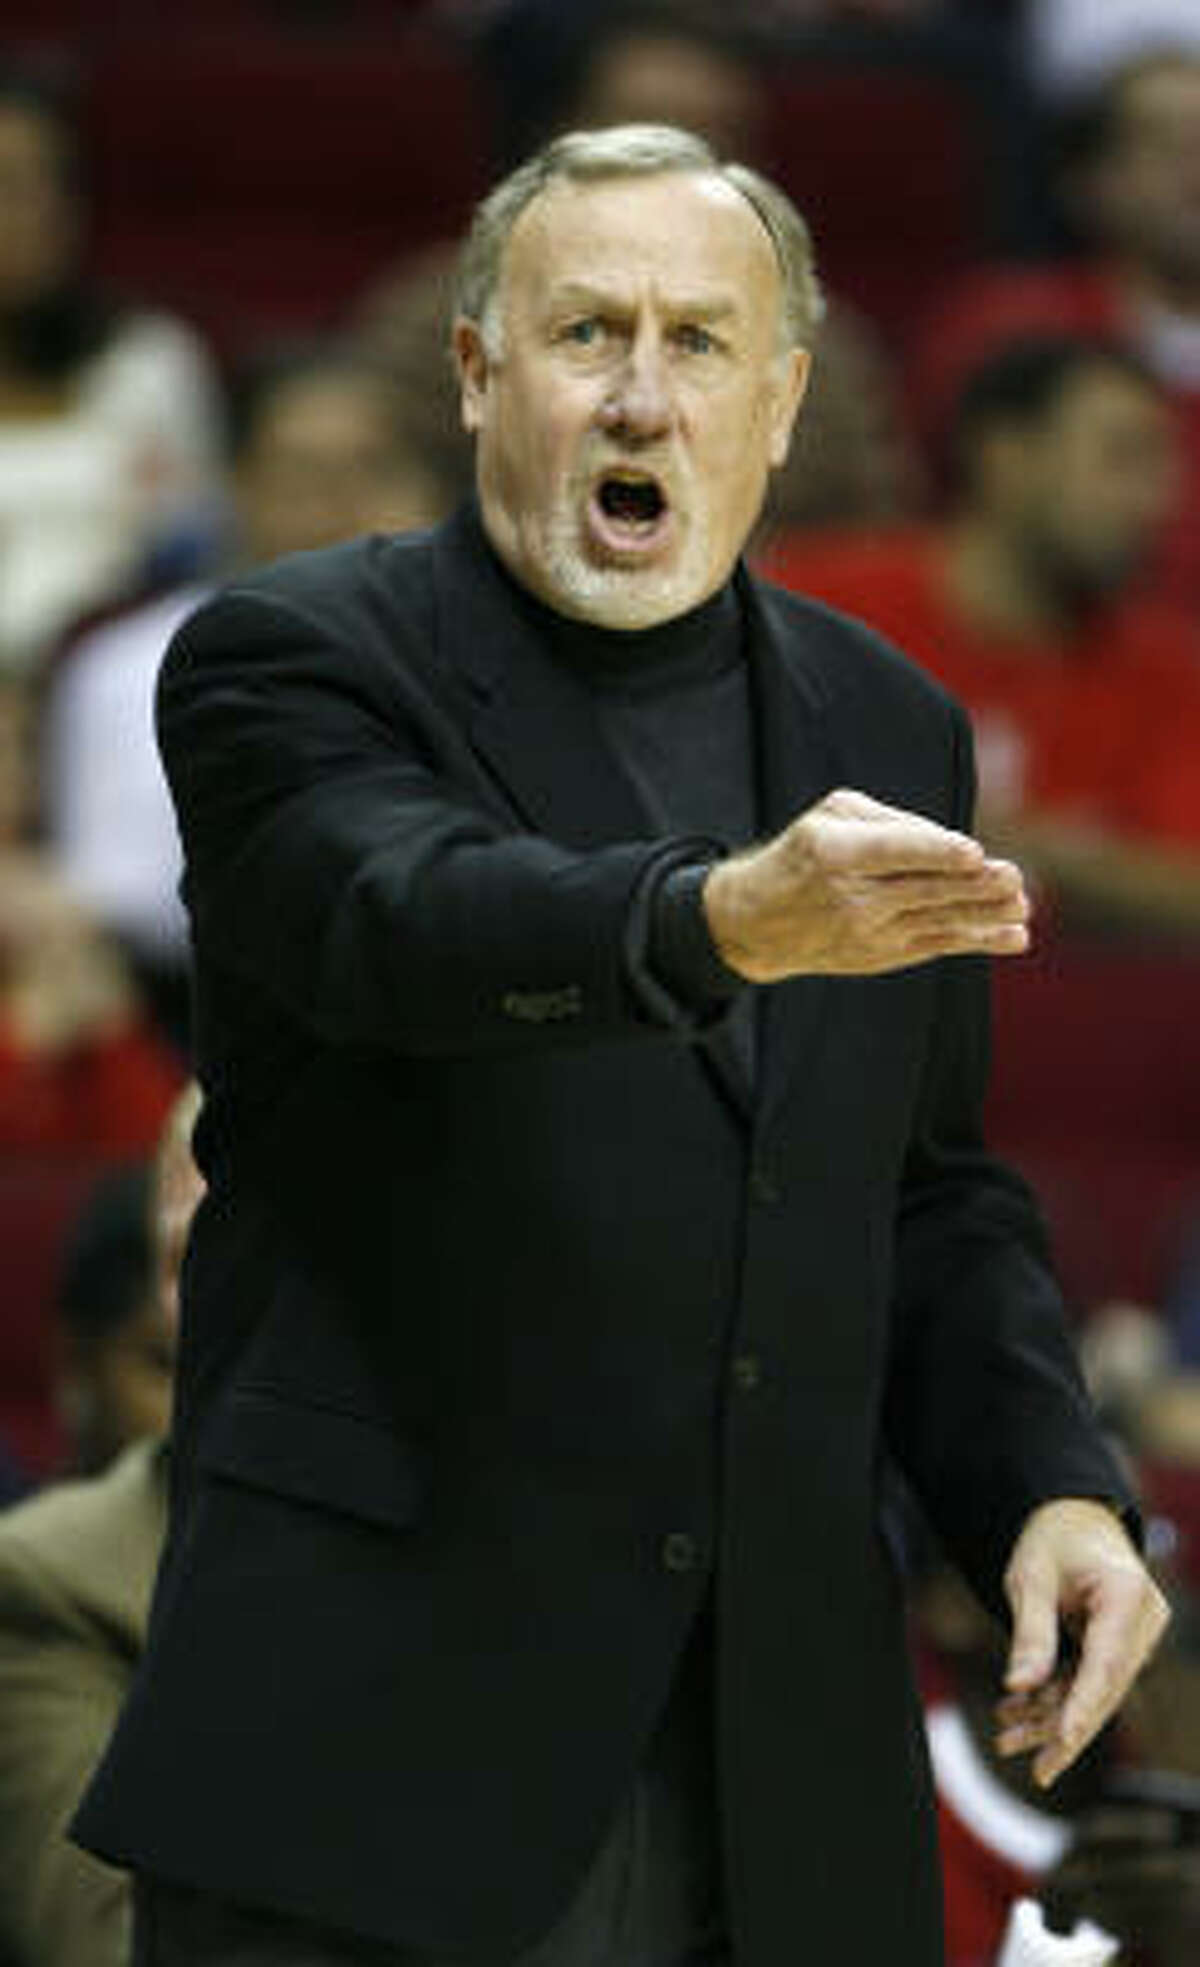 Bucks 96, Rockets 92 Rockets head coach Rick Adelman yells at a referee during the first half.